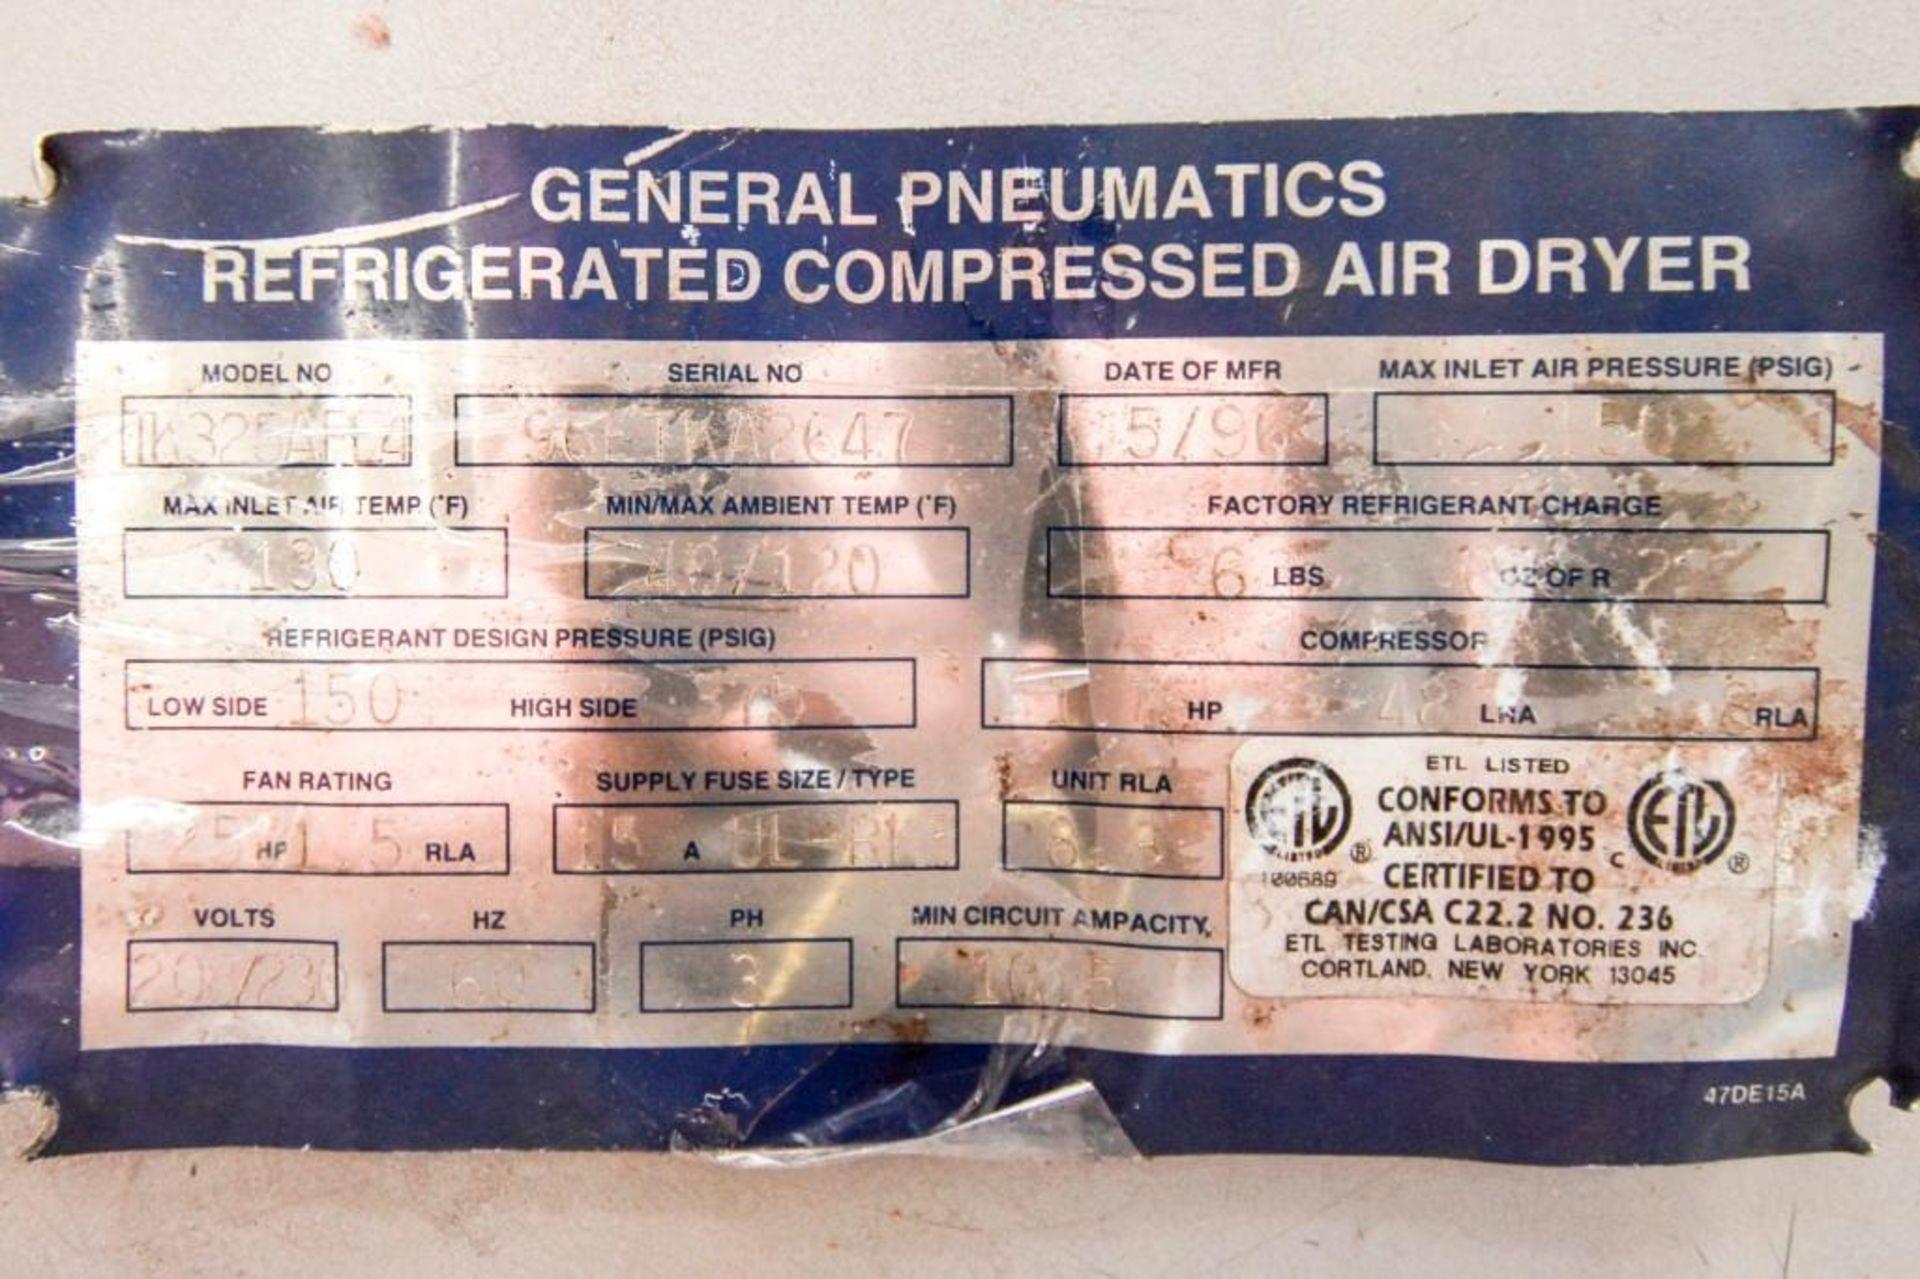 General Pneumatics Compressed Air Dryer - Image 8 of 12